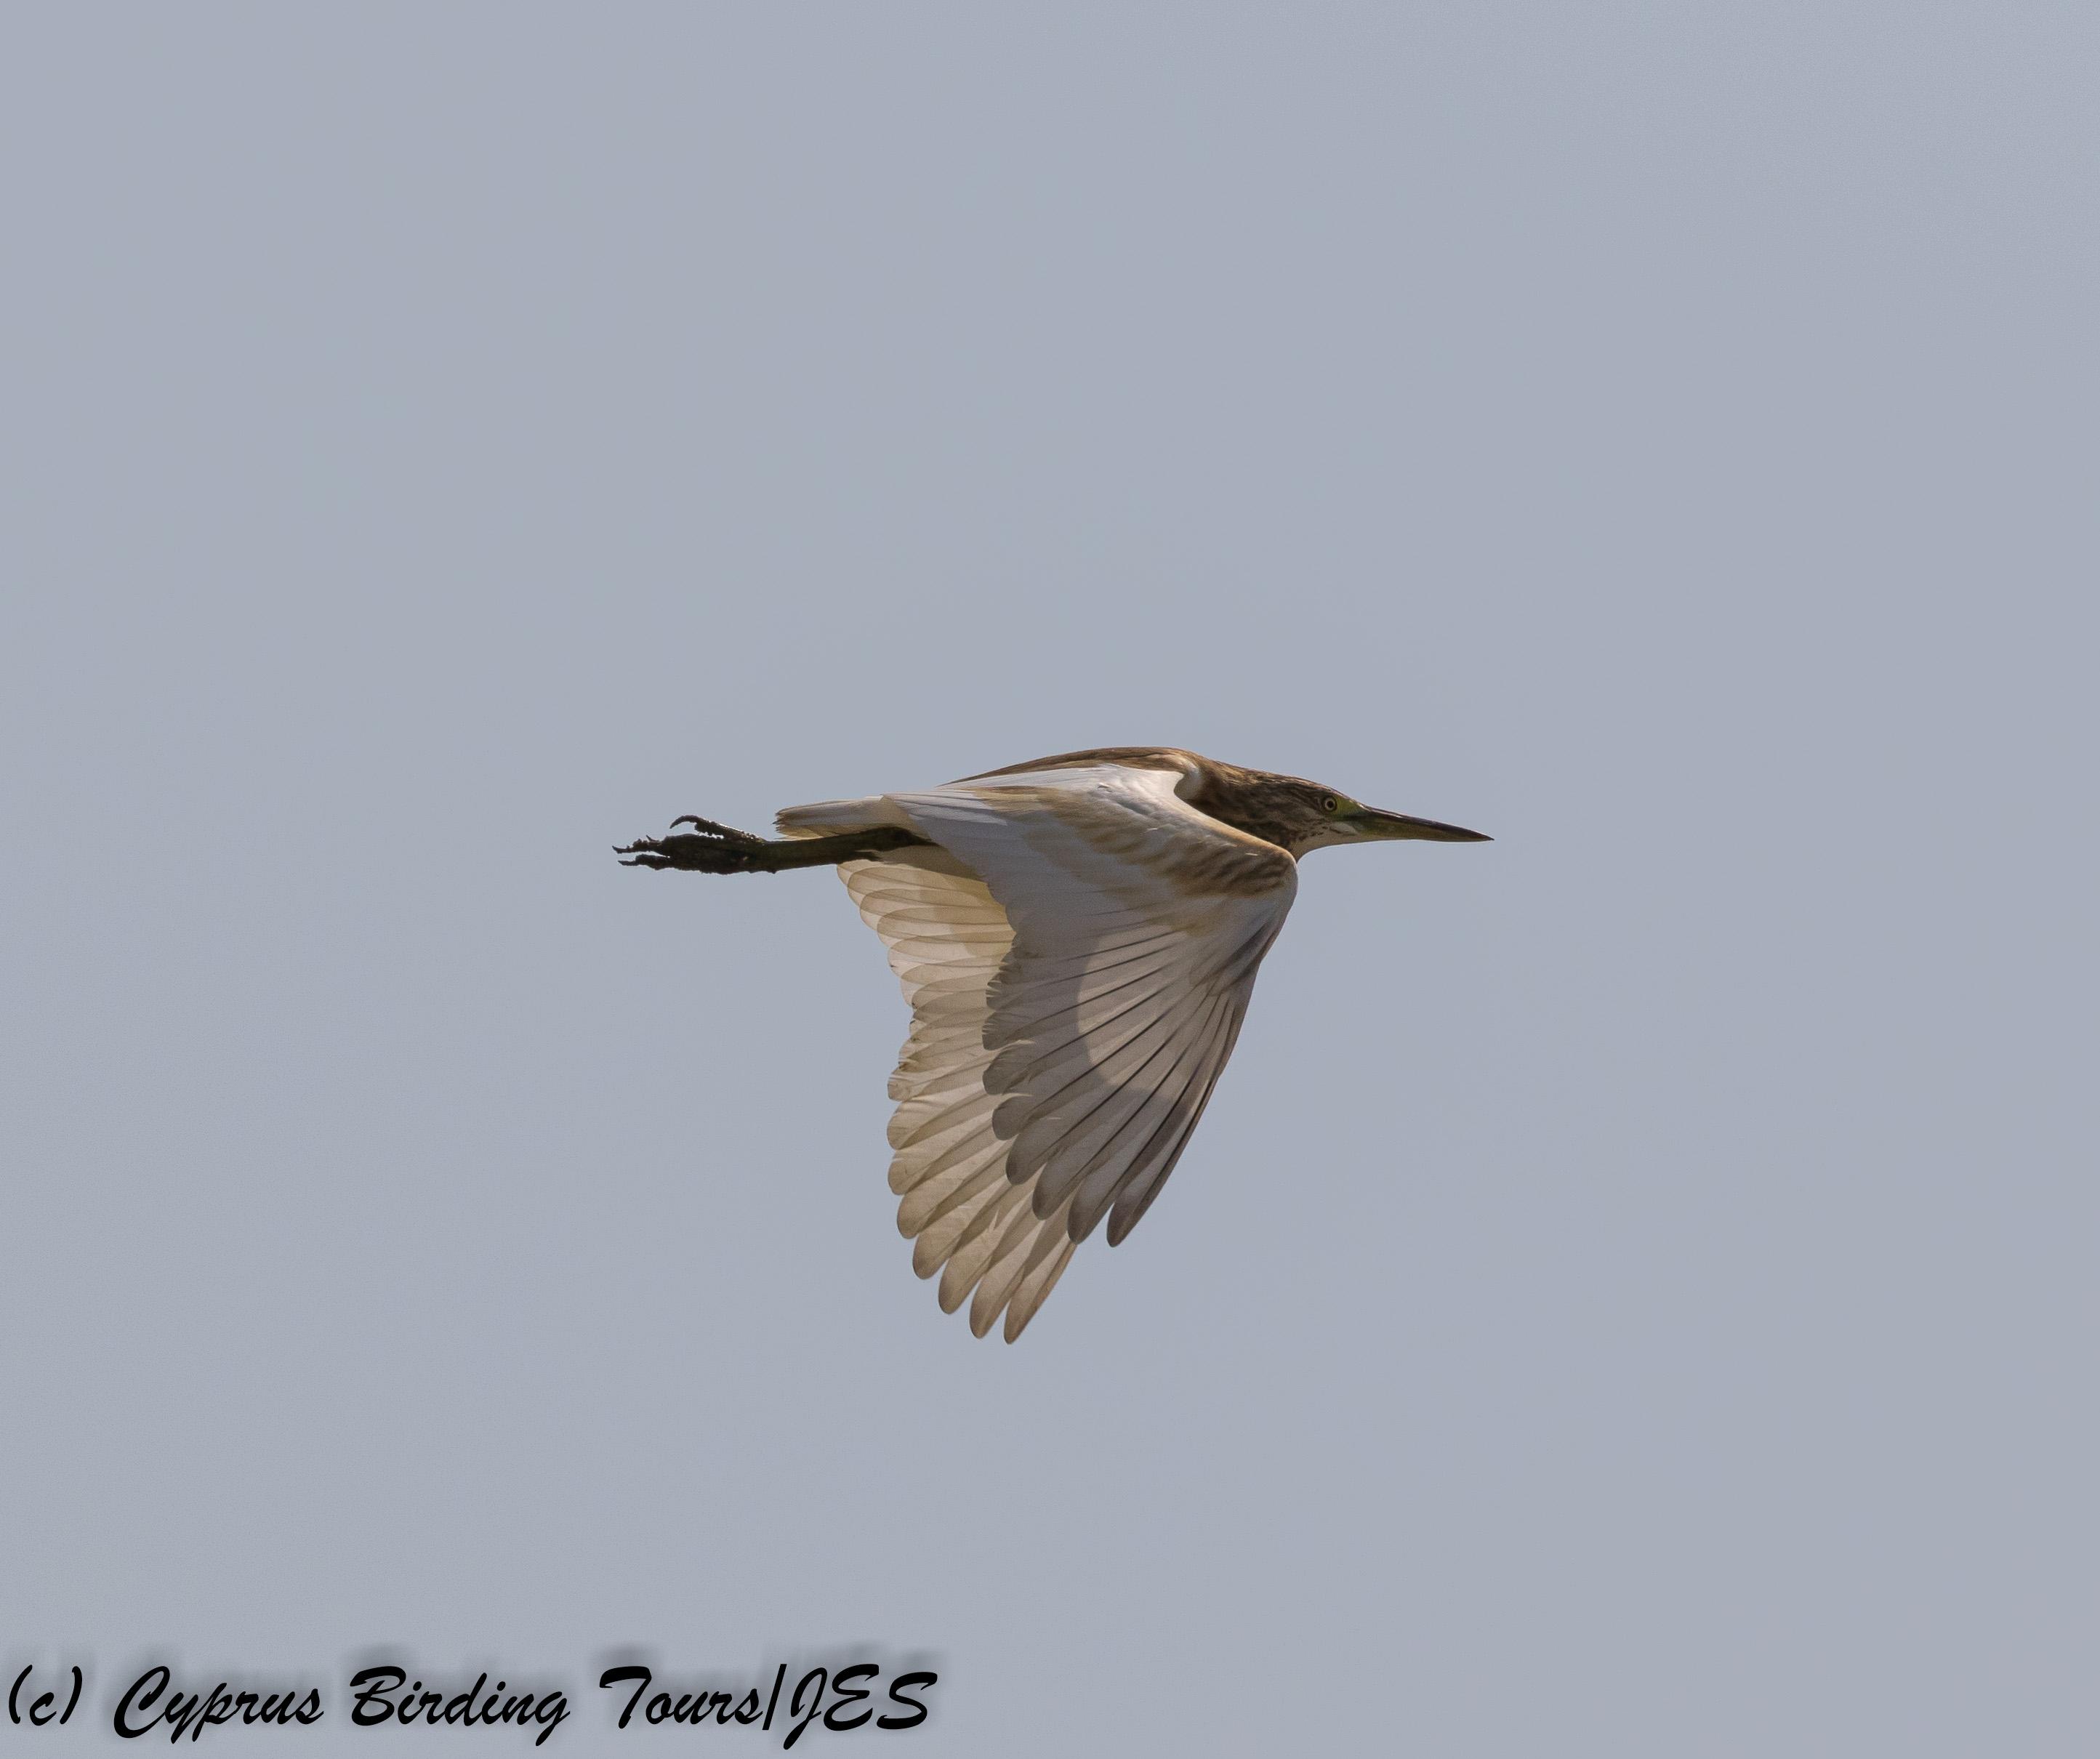 Squacco Heron, Larnaca 15th September 2017 (c) Cyprus Birding Tours